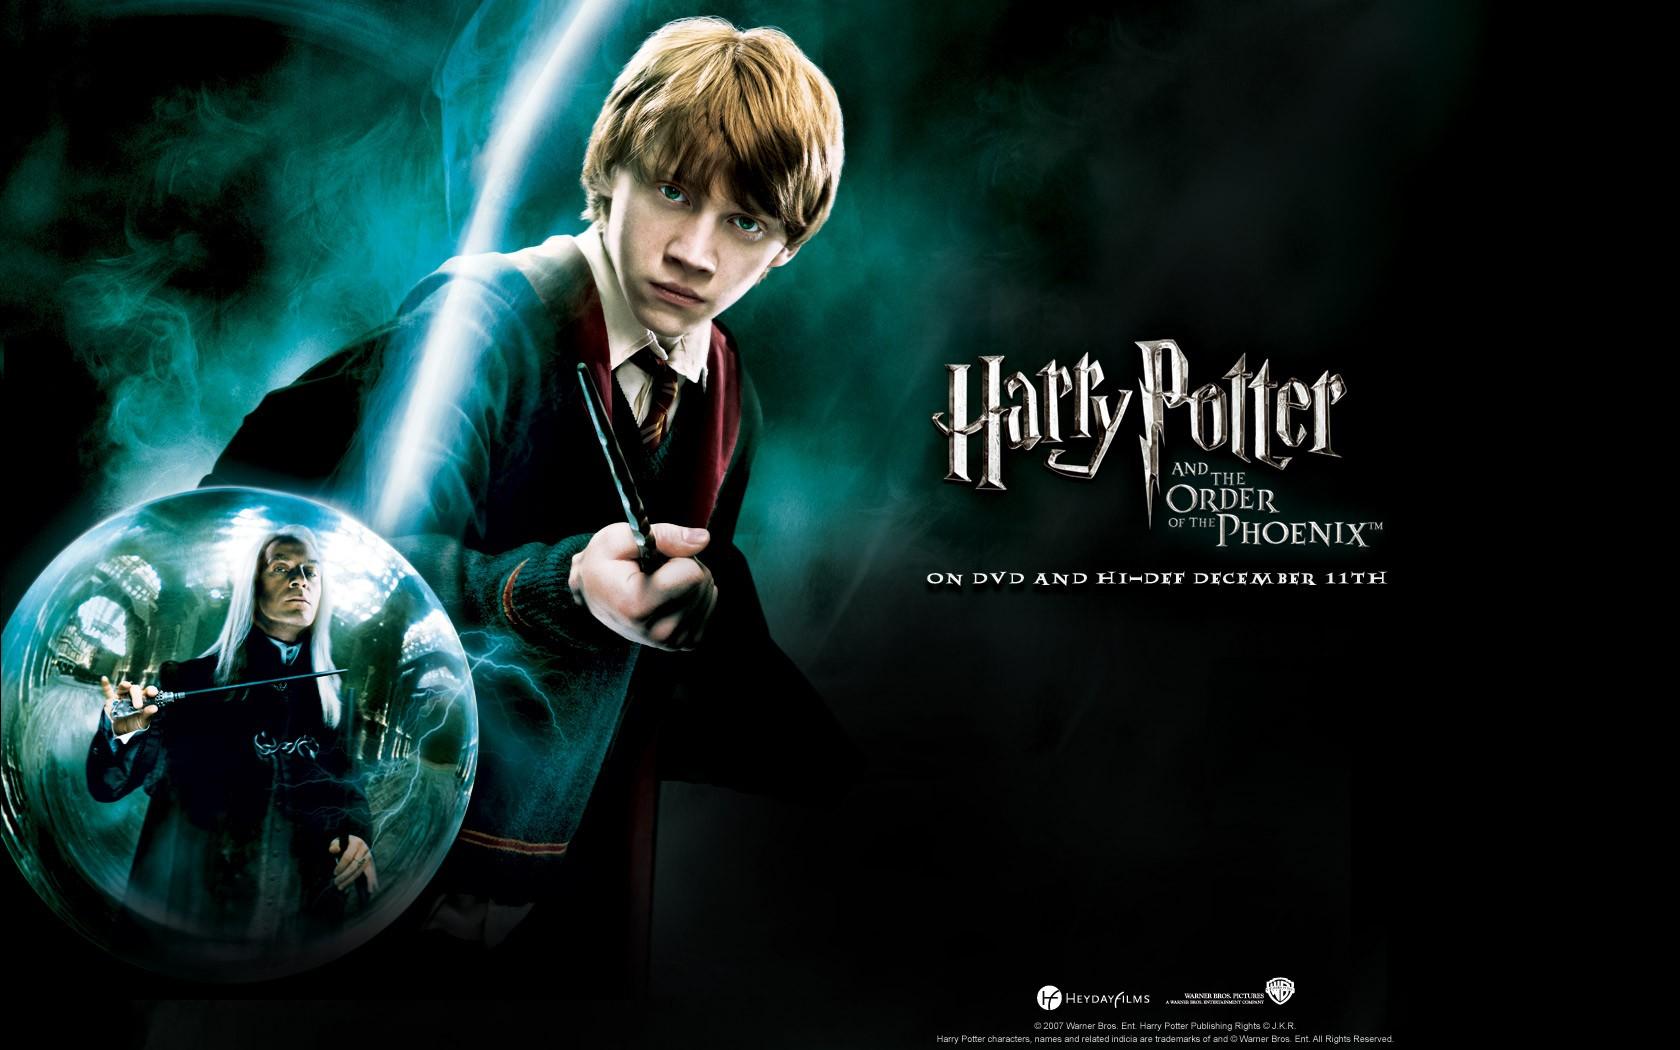 Un wallpaper ufficiale per Harry Potter and the Order of the Phoenix con Rupert Grint